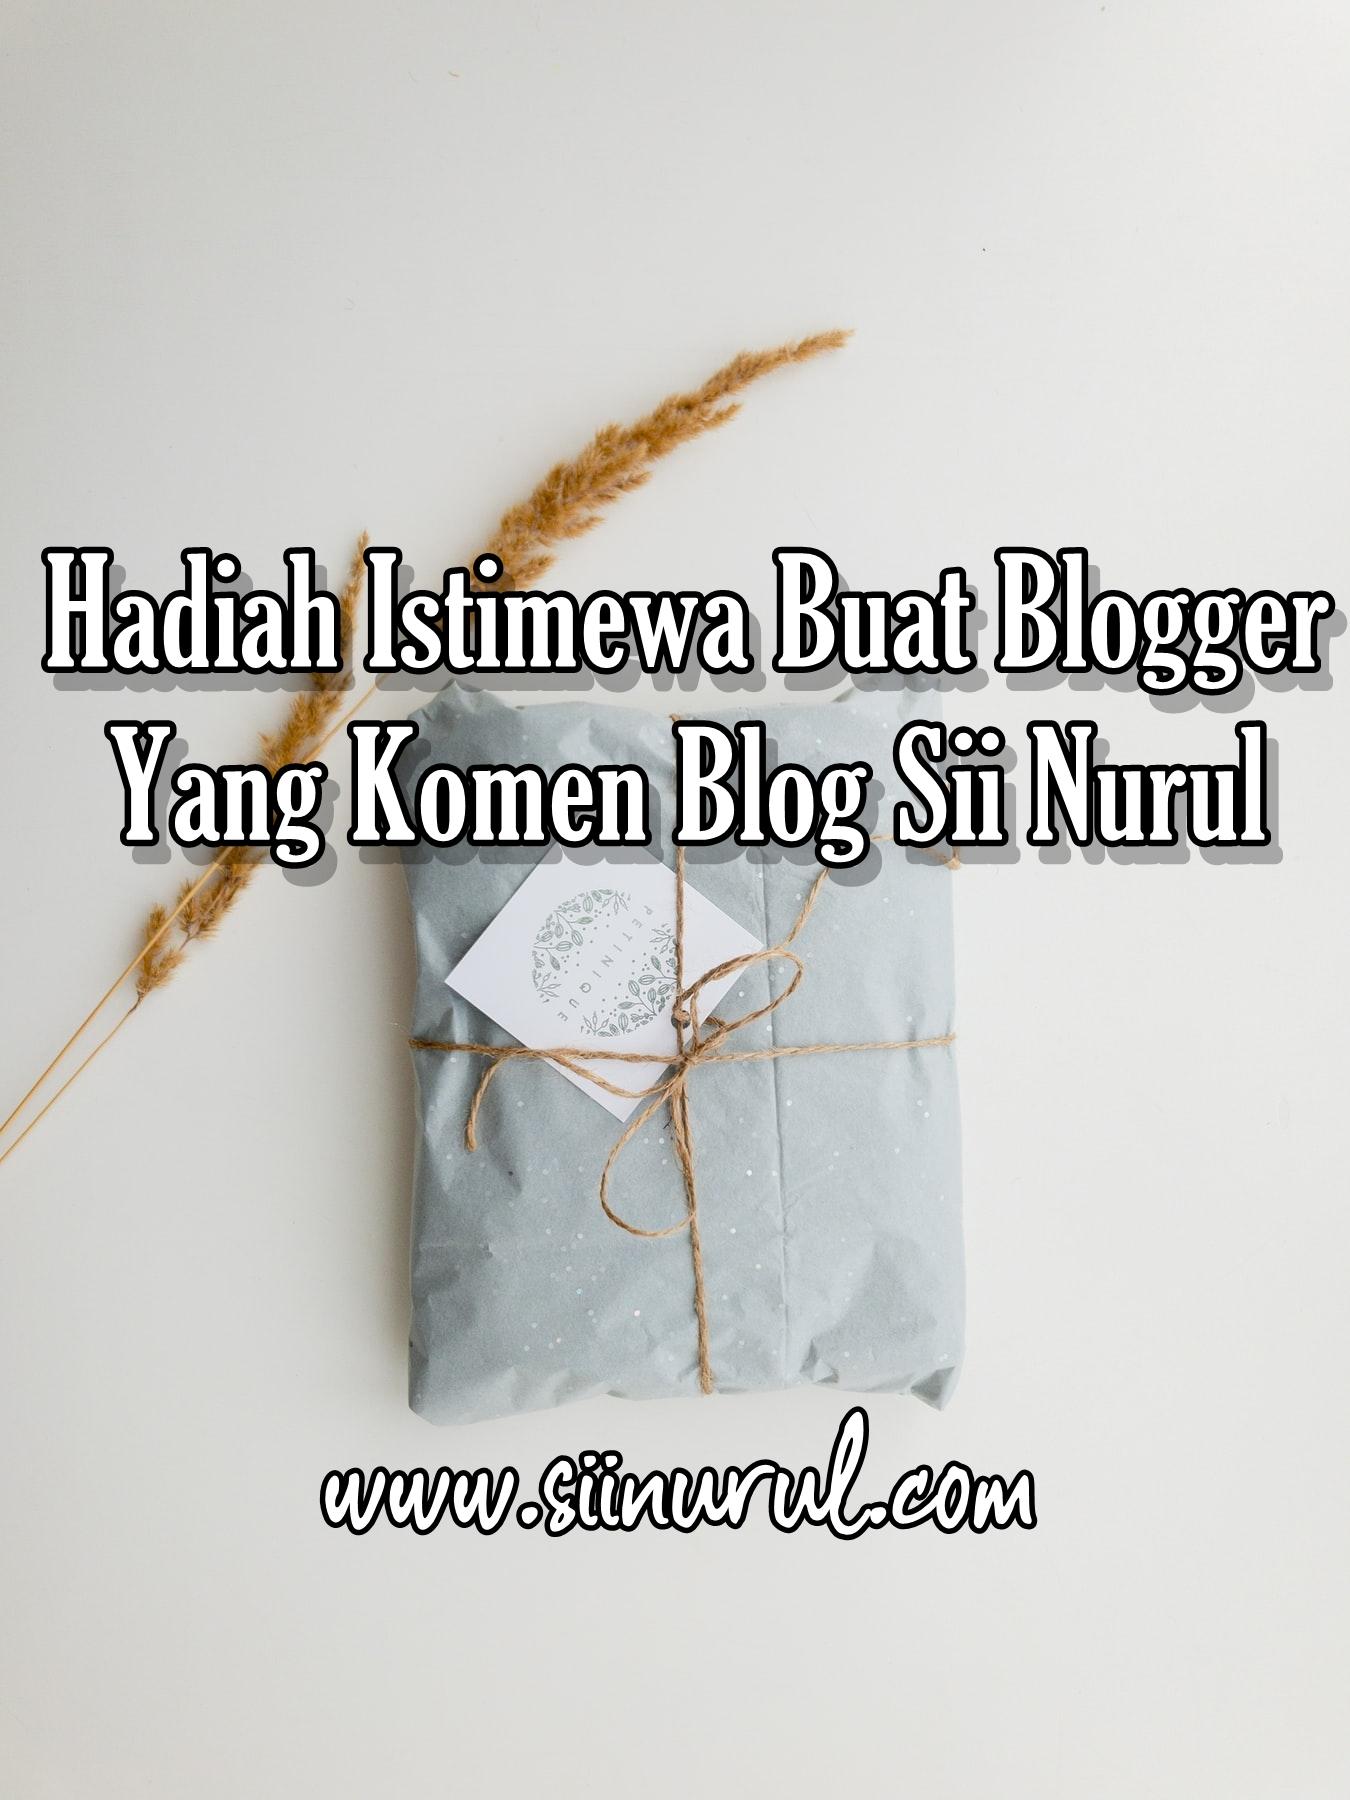 Blogger Yang Komen Blog Sii Nurul